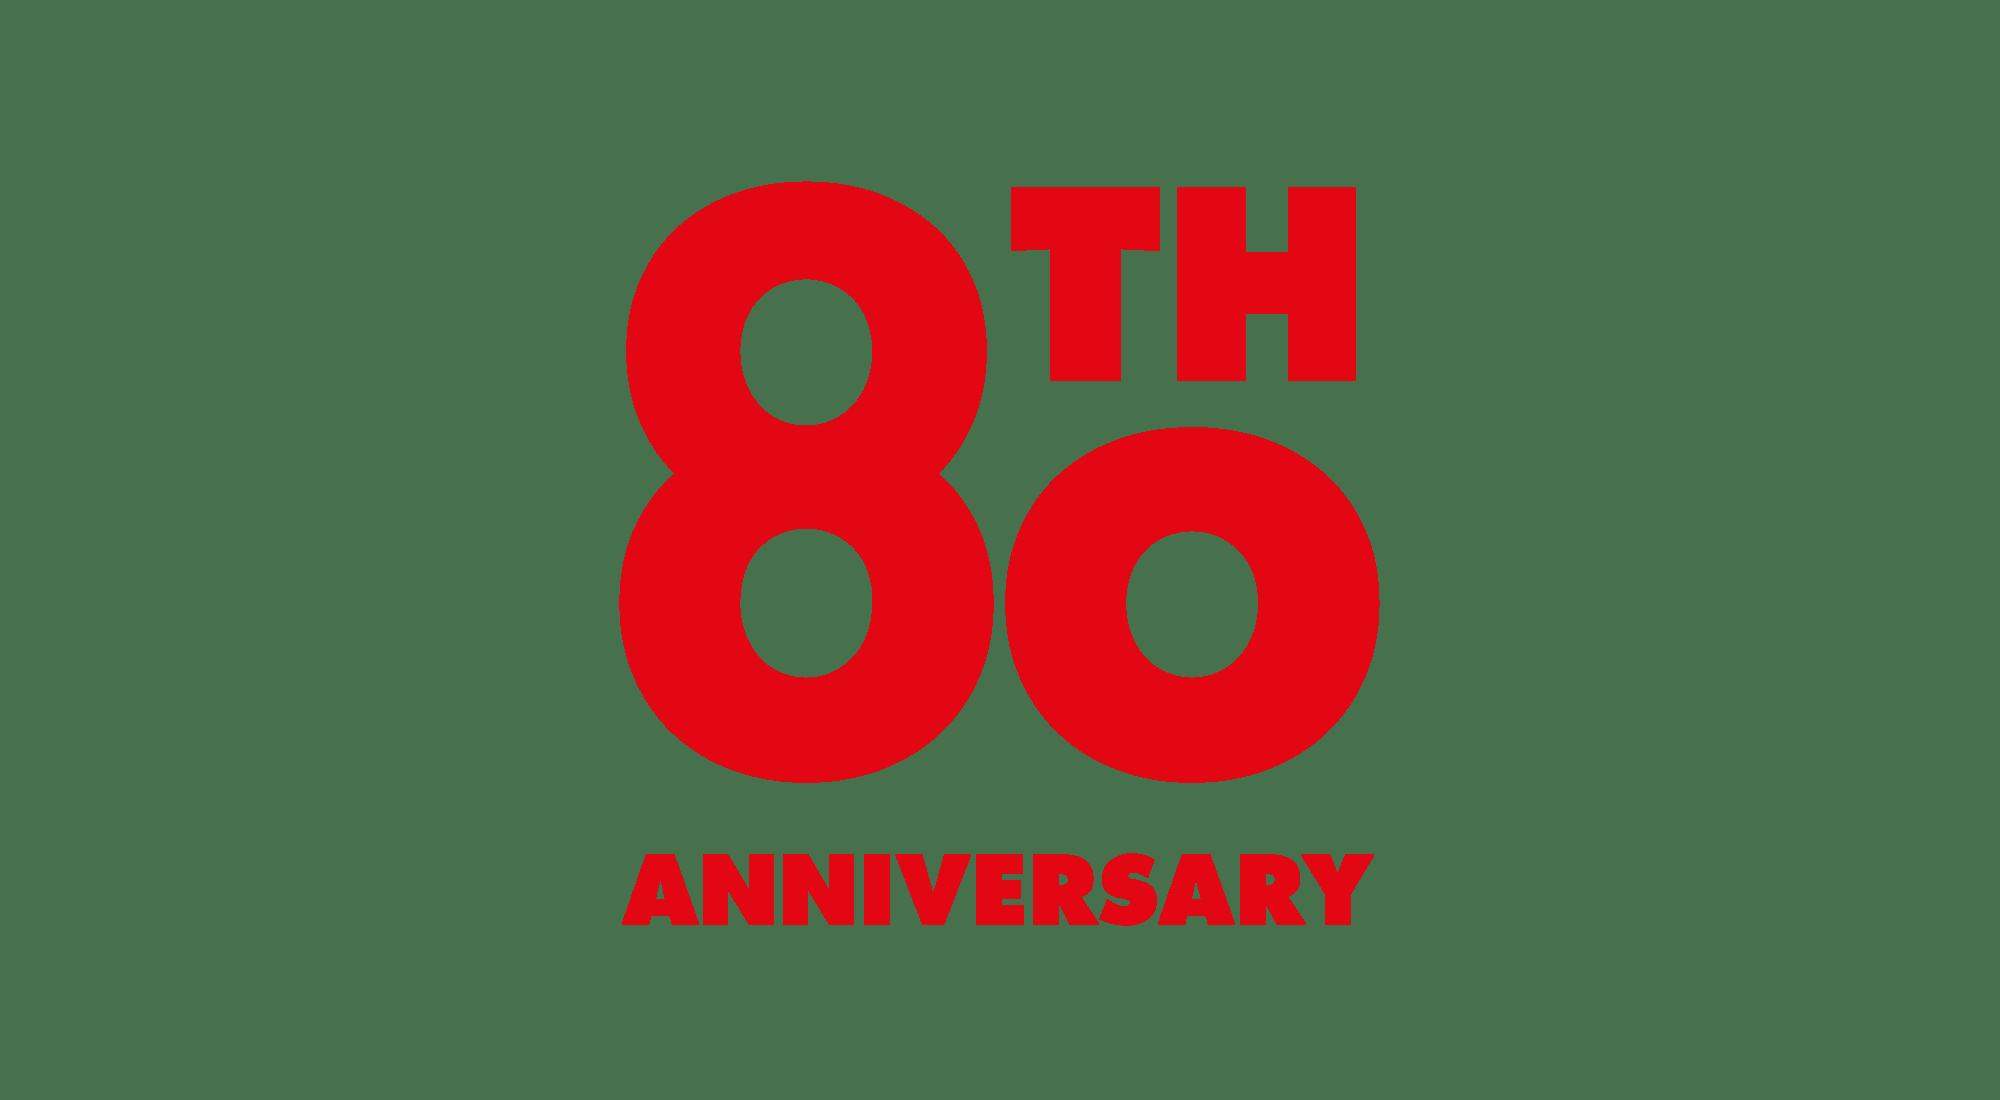 logo, 80th anniversary, rockwool, germany